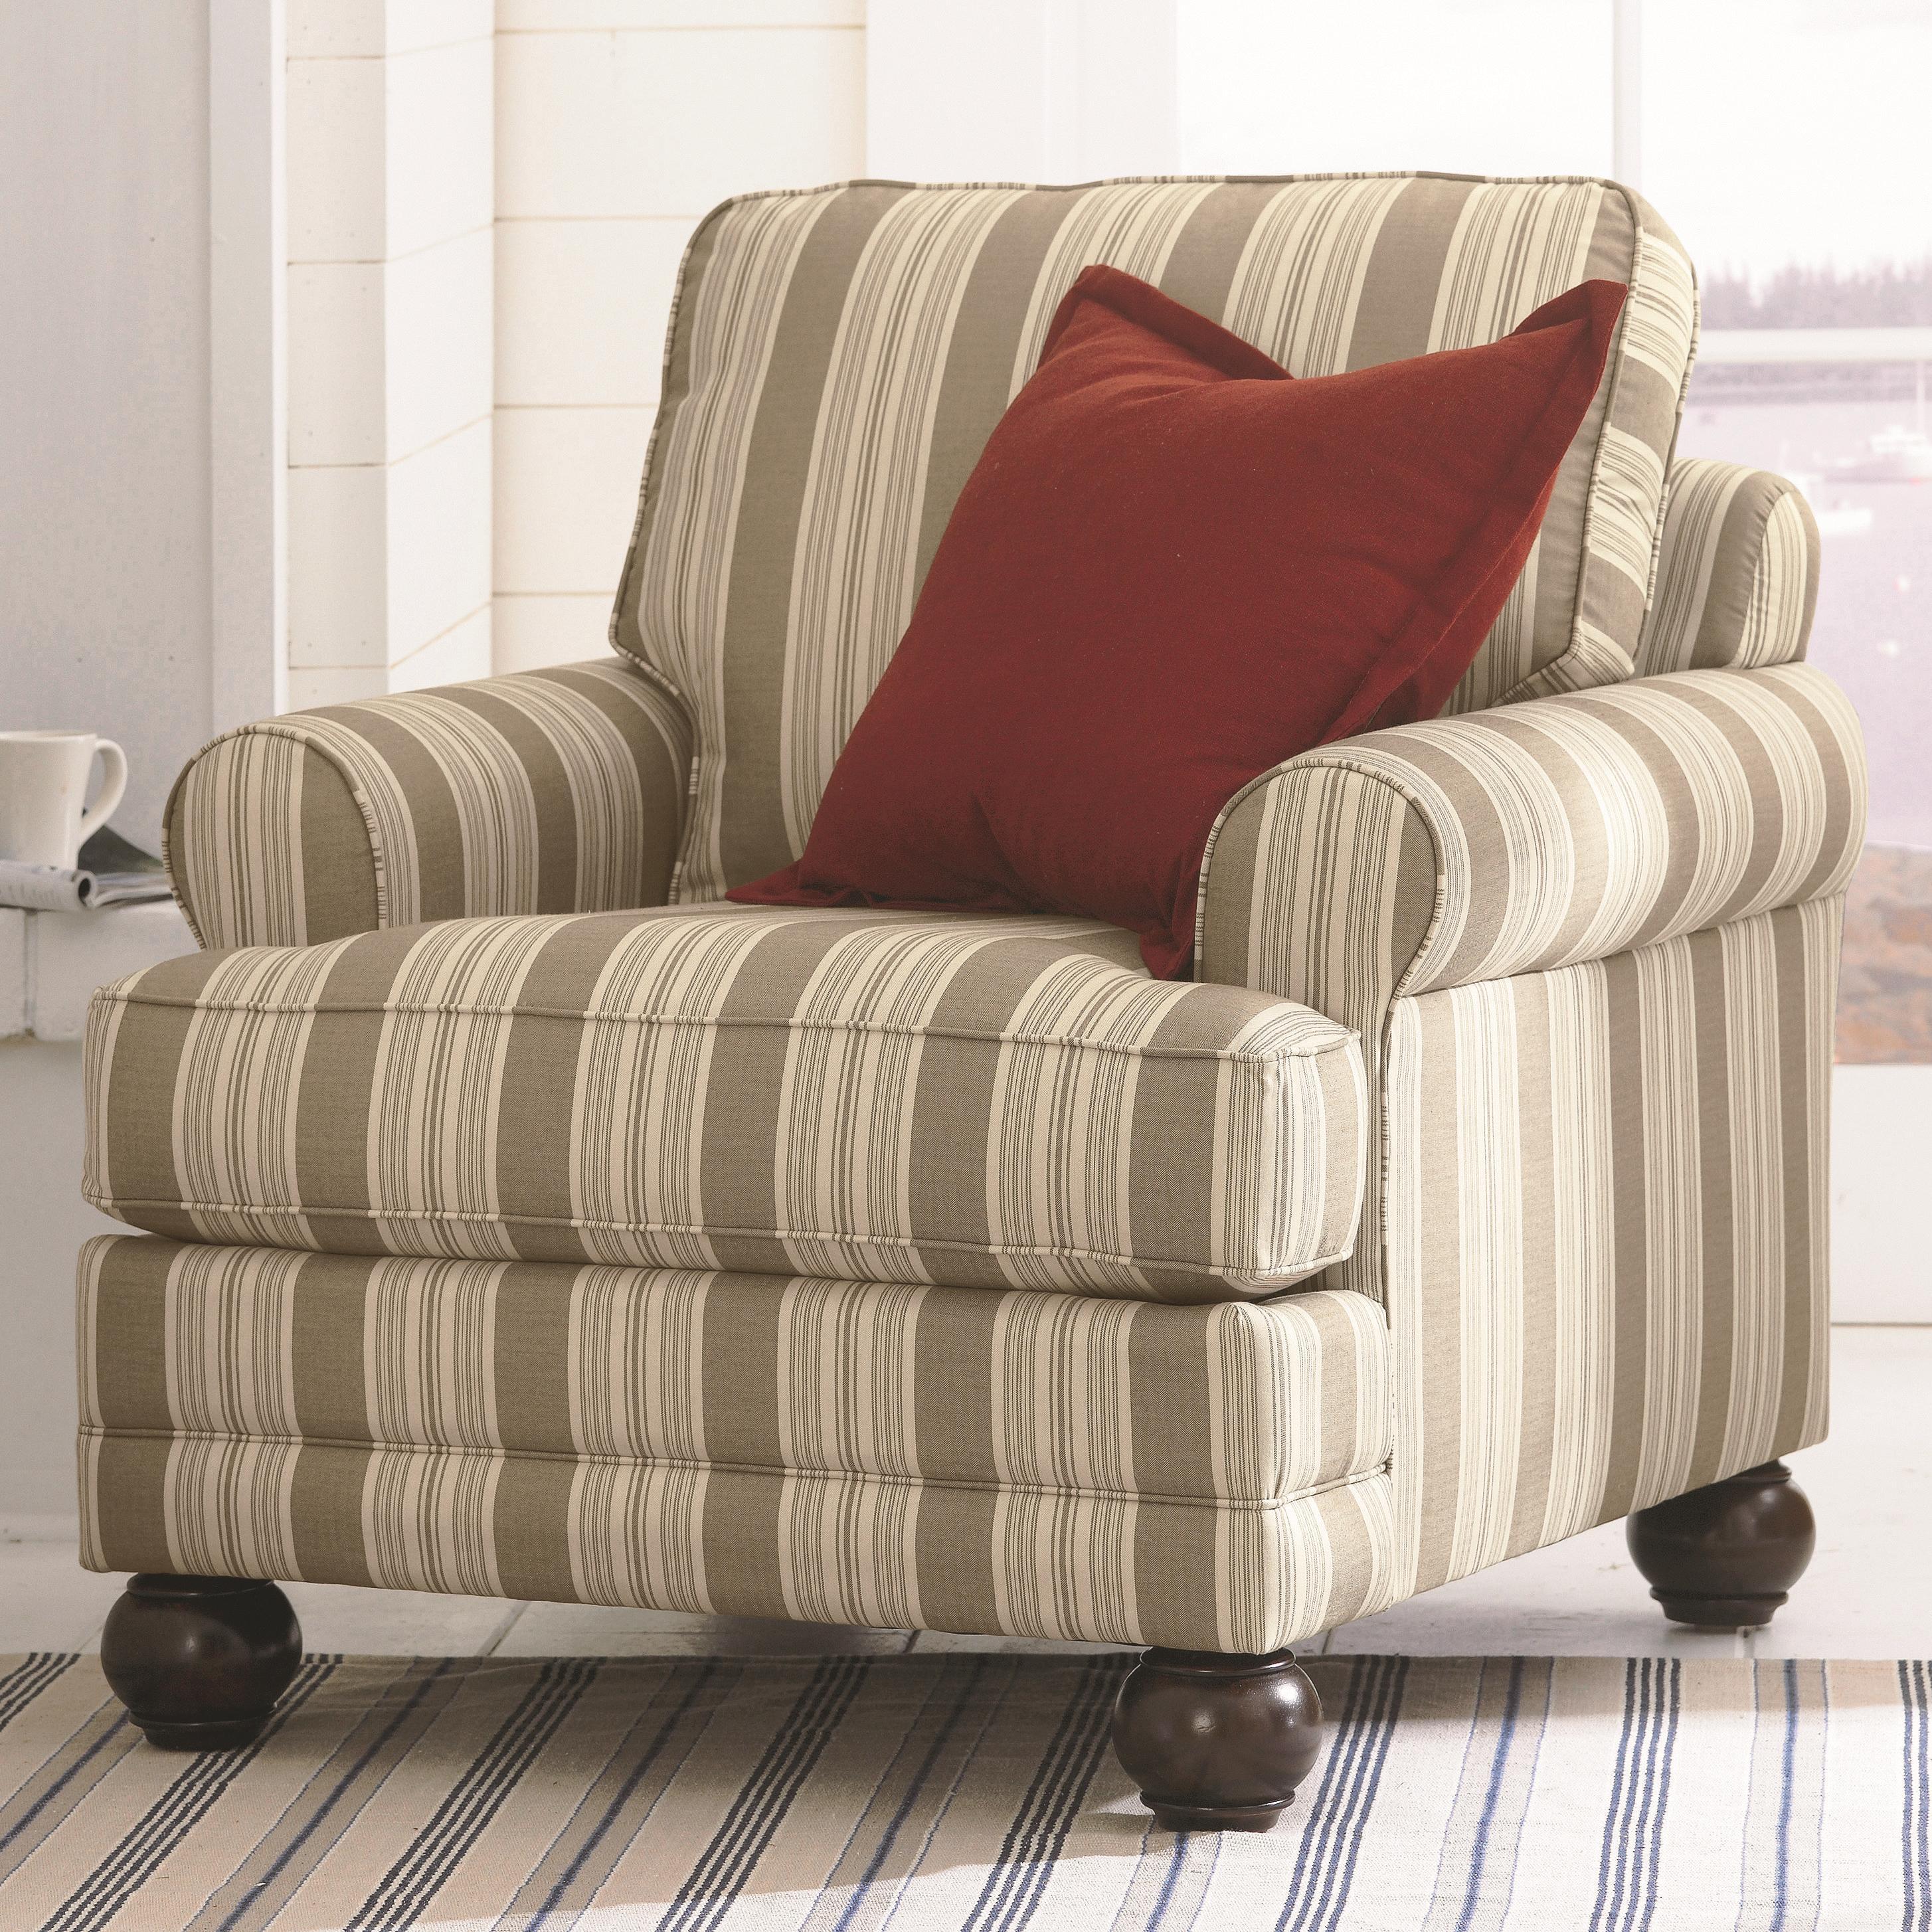 Bassett Custom Upholstery   Loft U003cbu003eCustomizableu003c/bu003e Upholstered Chair With